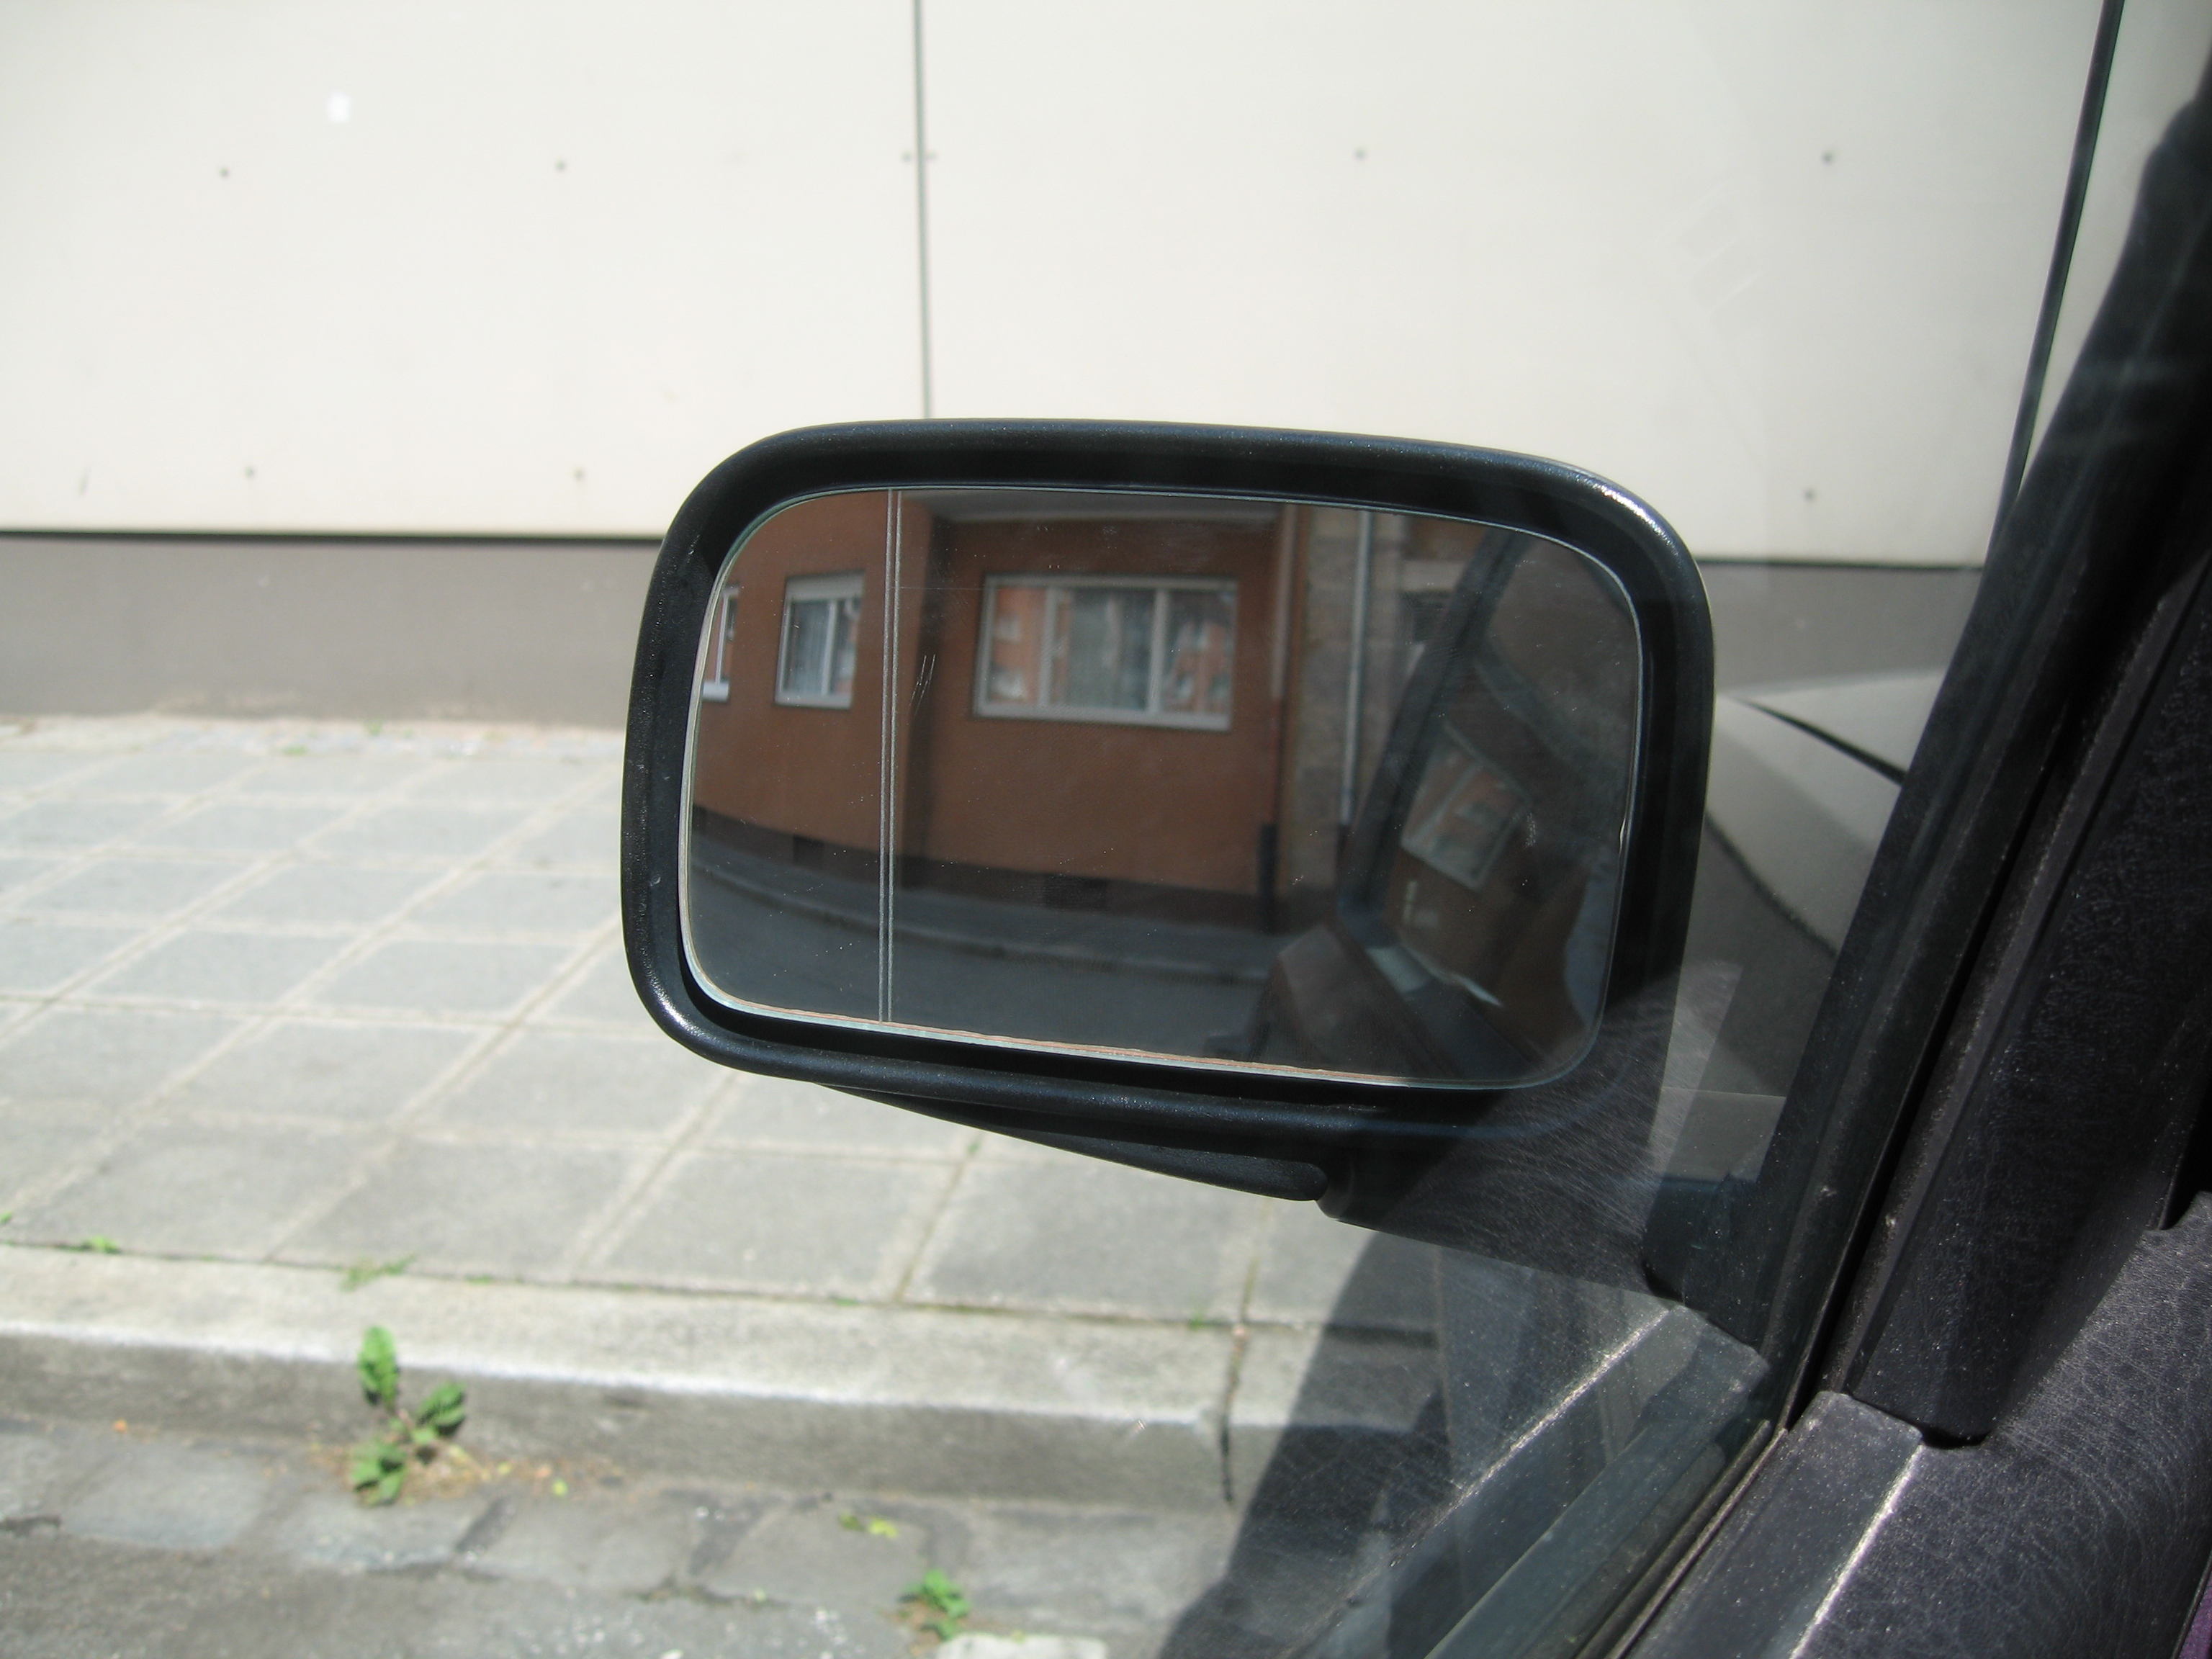 spiegel0024twv.jpg